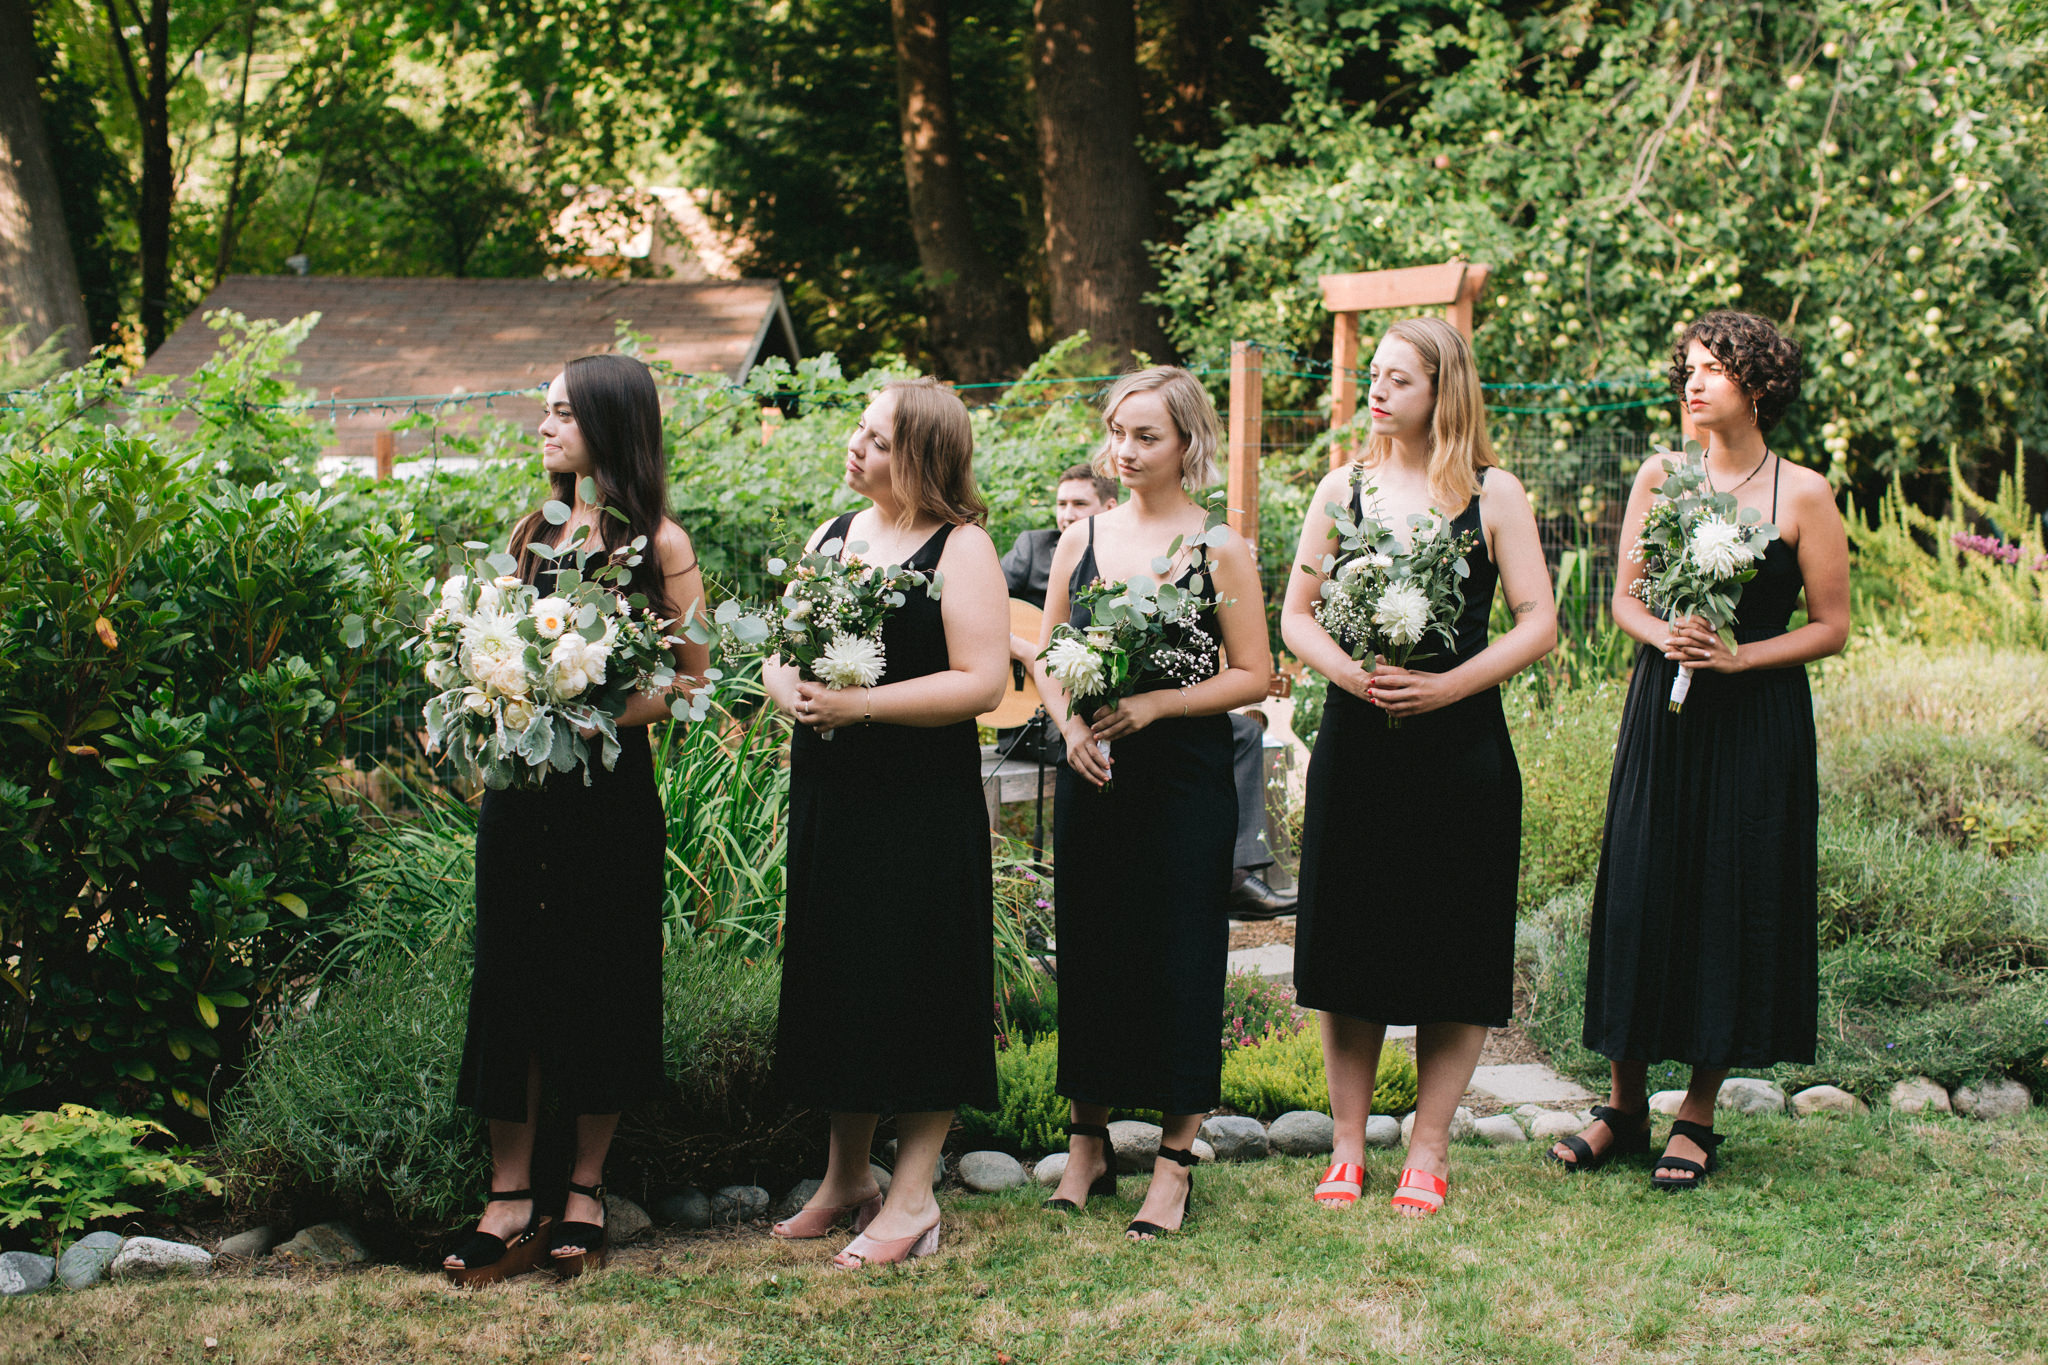 Backyard-Bainbridge-Island-Wedding-Alycia-Lovell-Photography-103.JPG